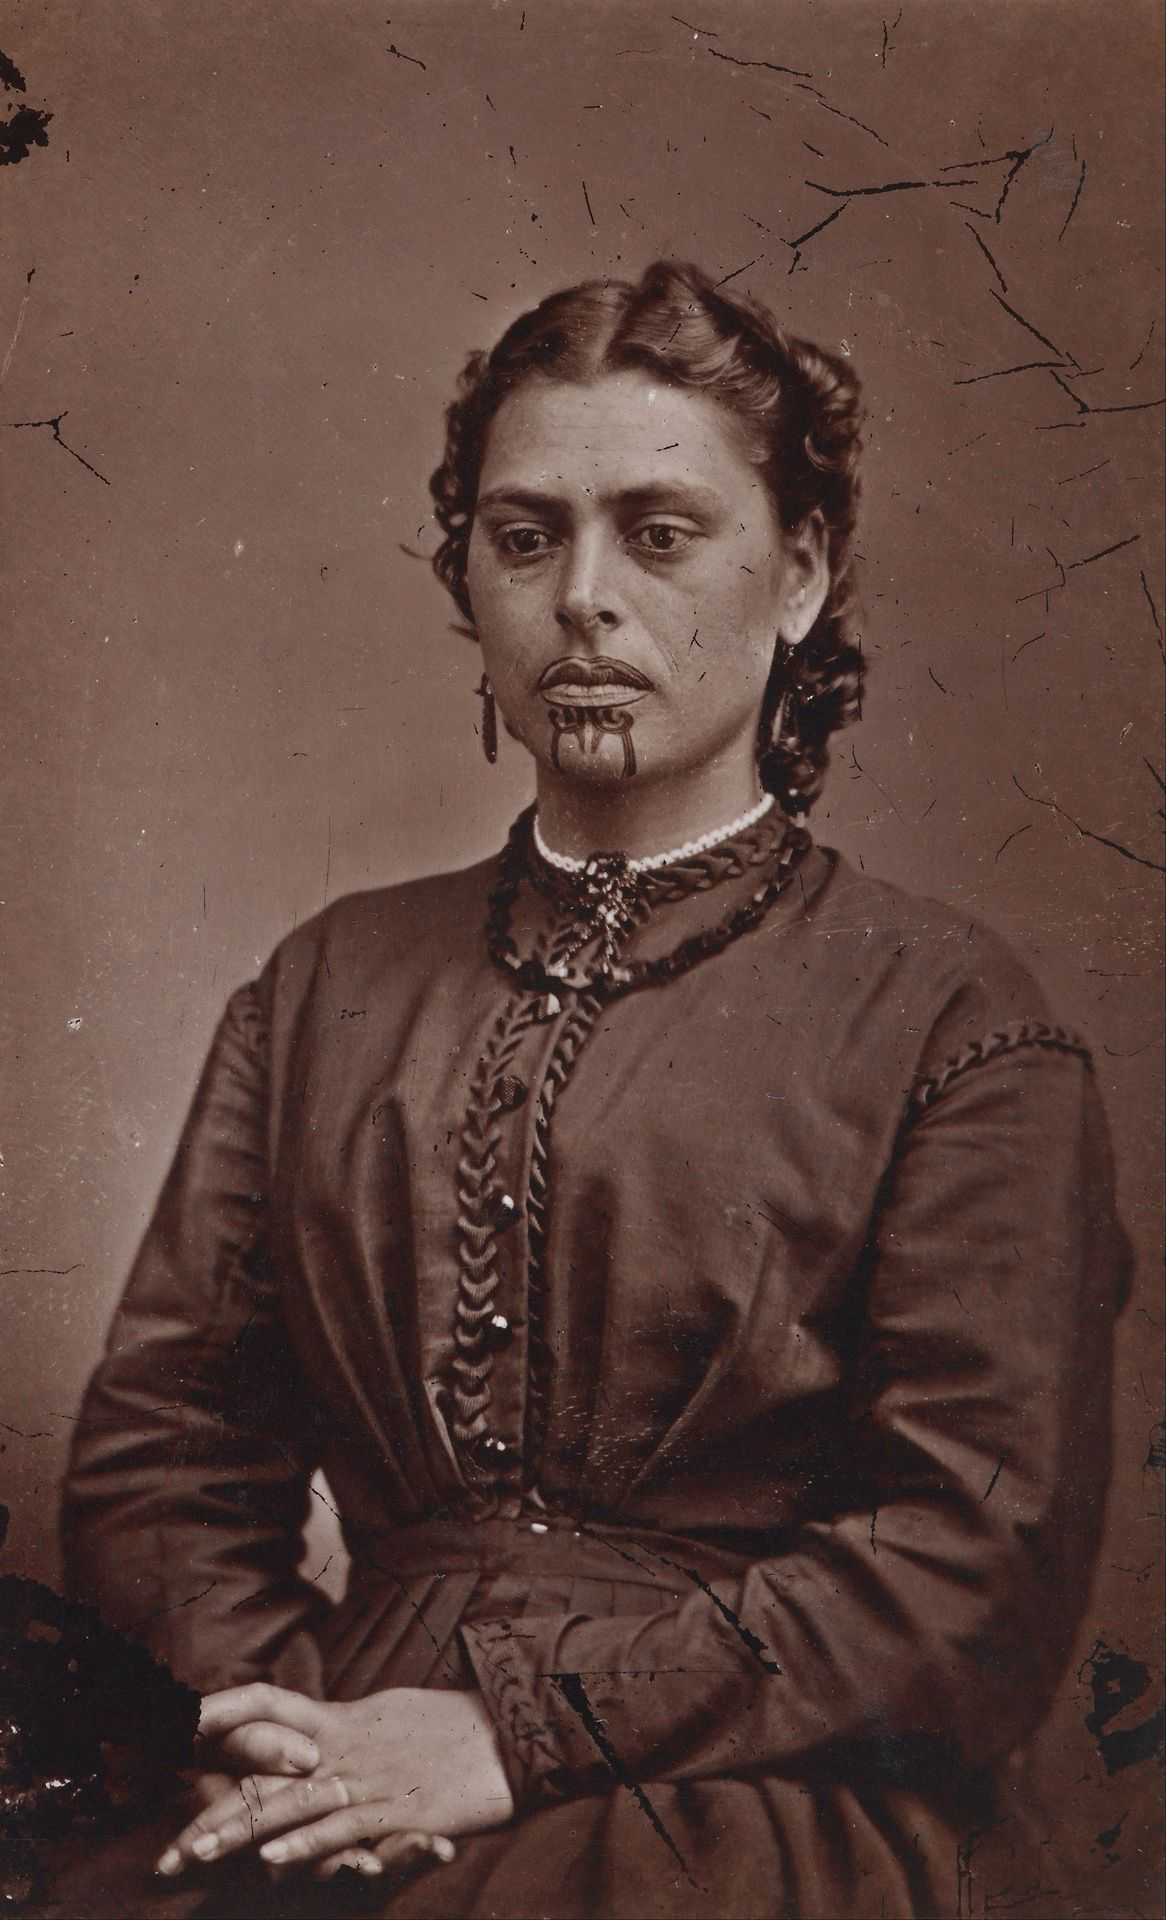 Maori Woman Face Tattoo: Mrs Rabone, 1871. American Photographic Company (Auckland